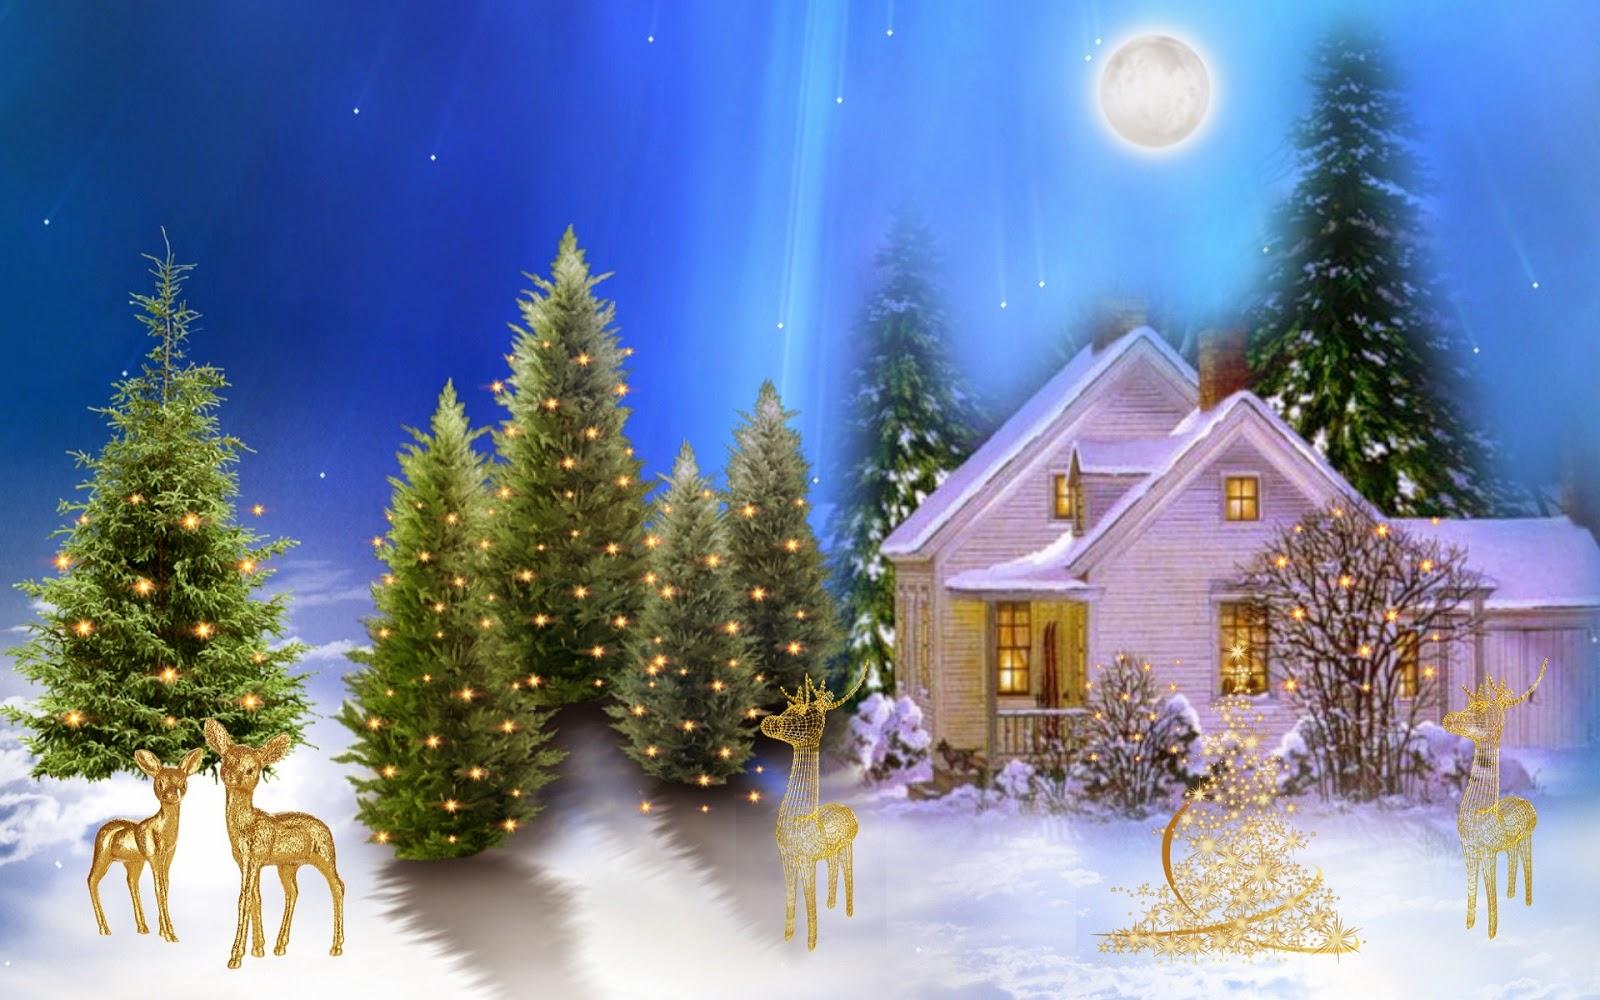 Christmas Tree Decorations Happy New Year 2019